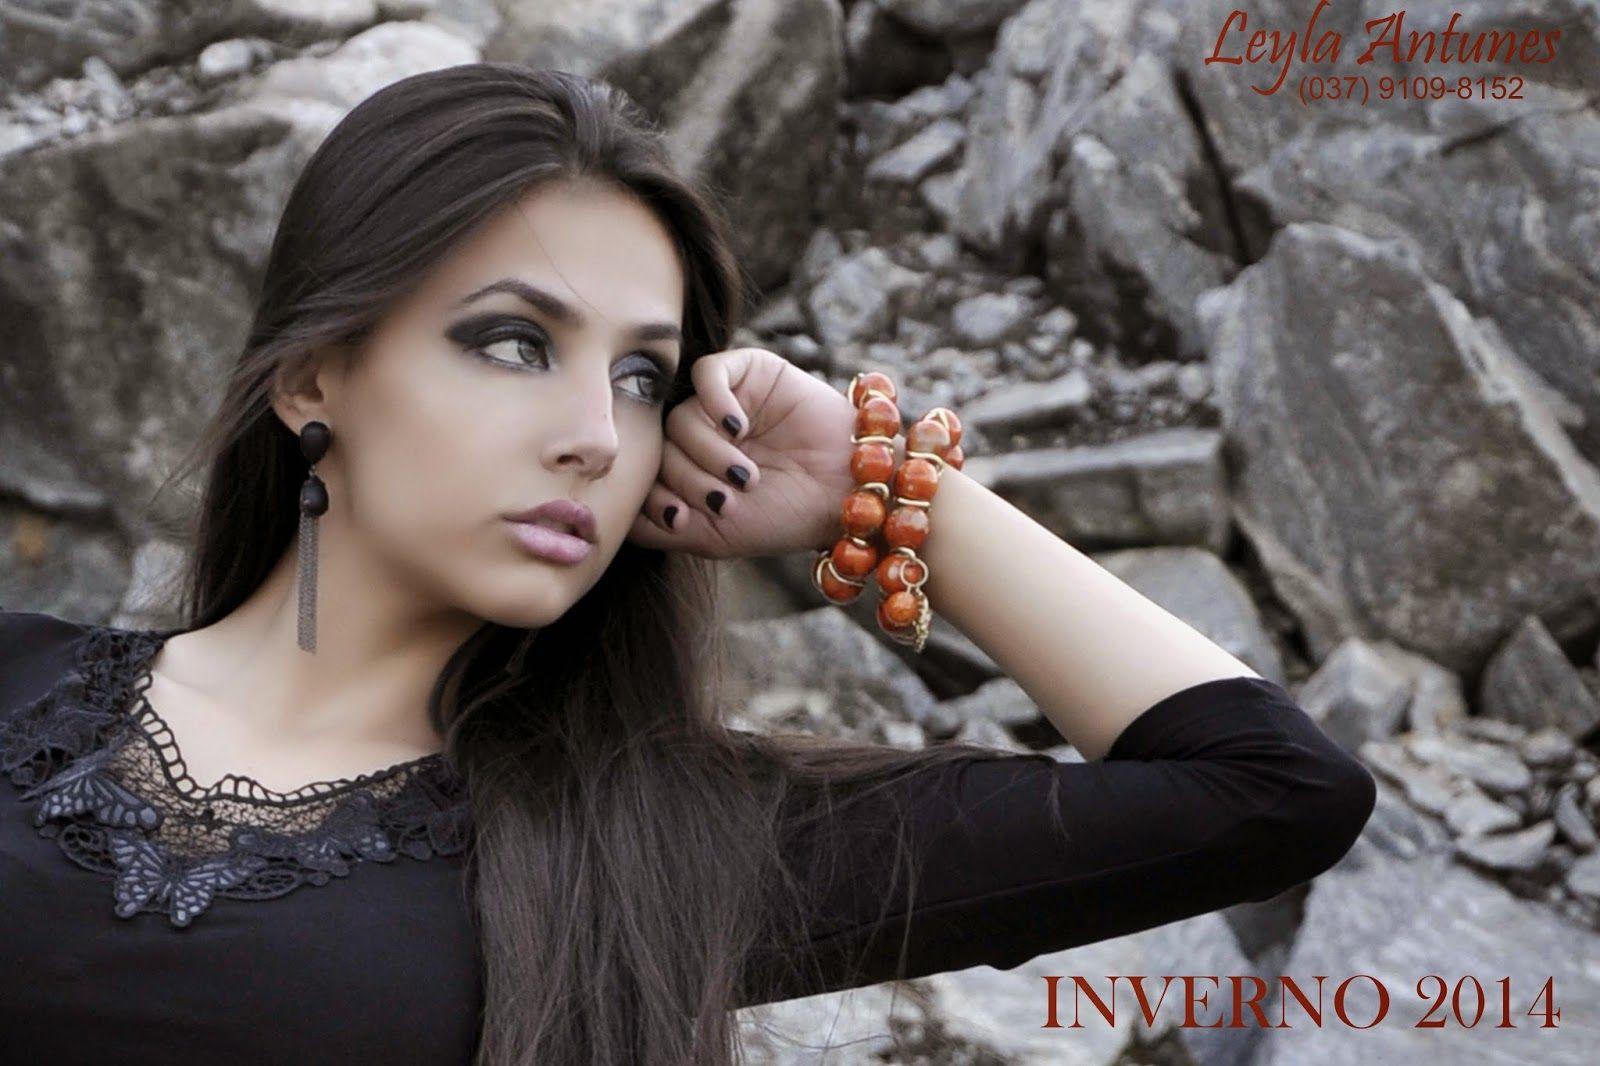 Leyla Antunes : OUTONO INVERNO 2014